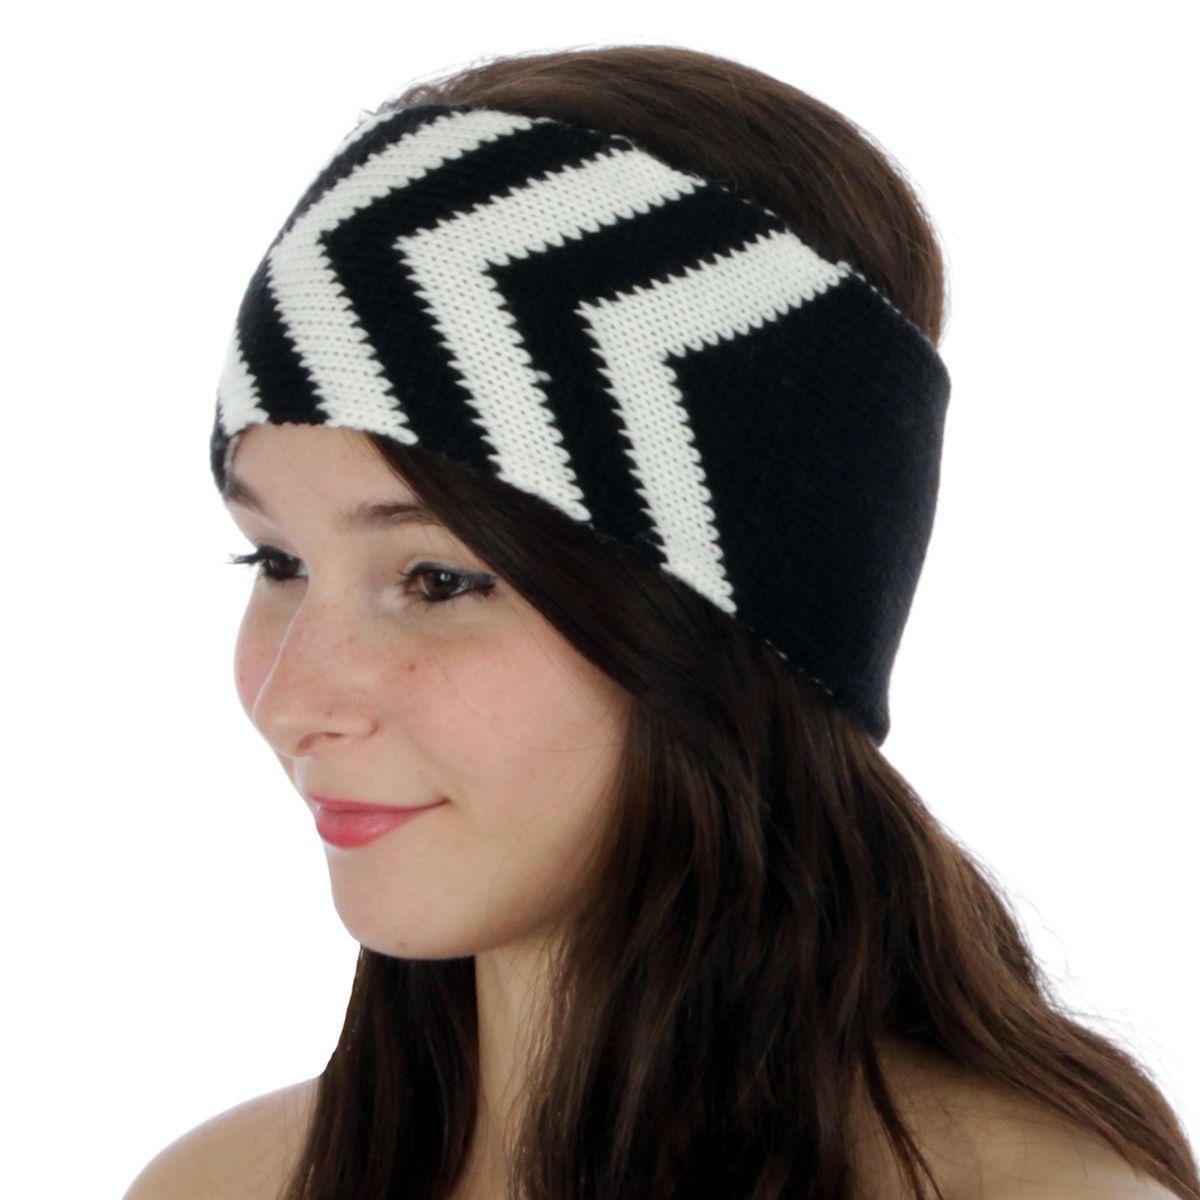 Winter Amazon Nike Com Knitted Reversible Mens Headband qwP8wxf